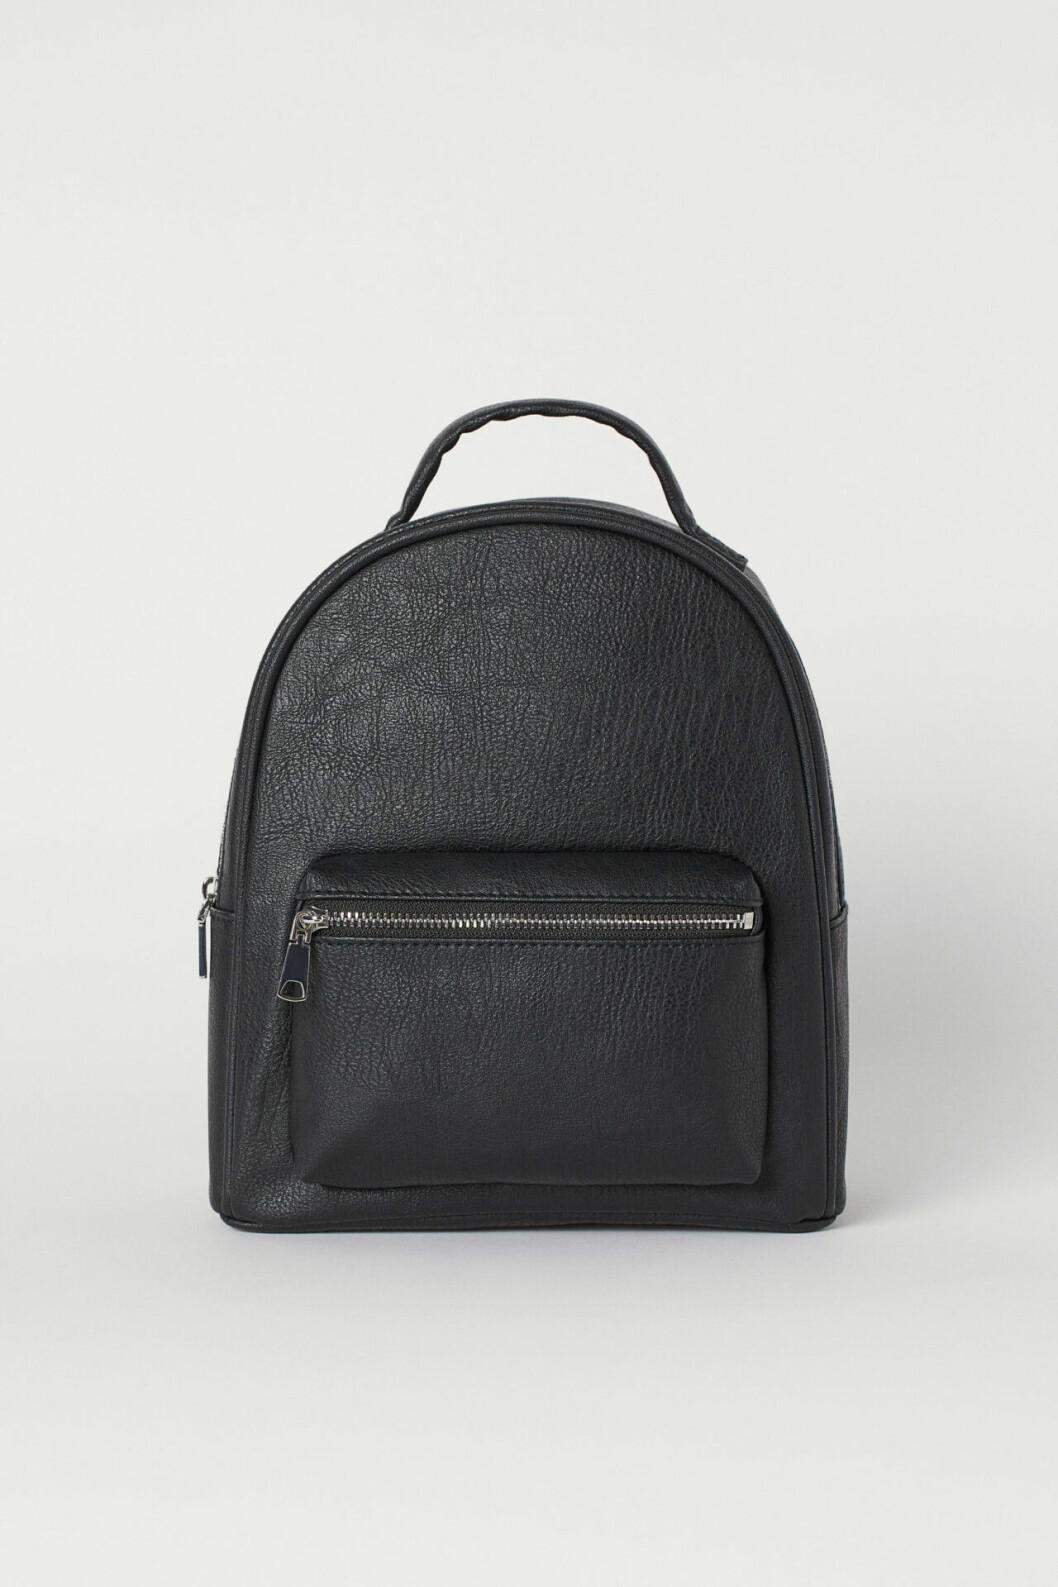 Svart ryggsäck från H&M